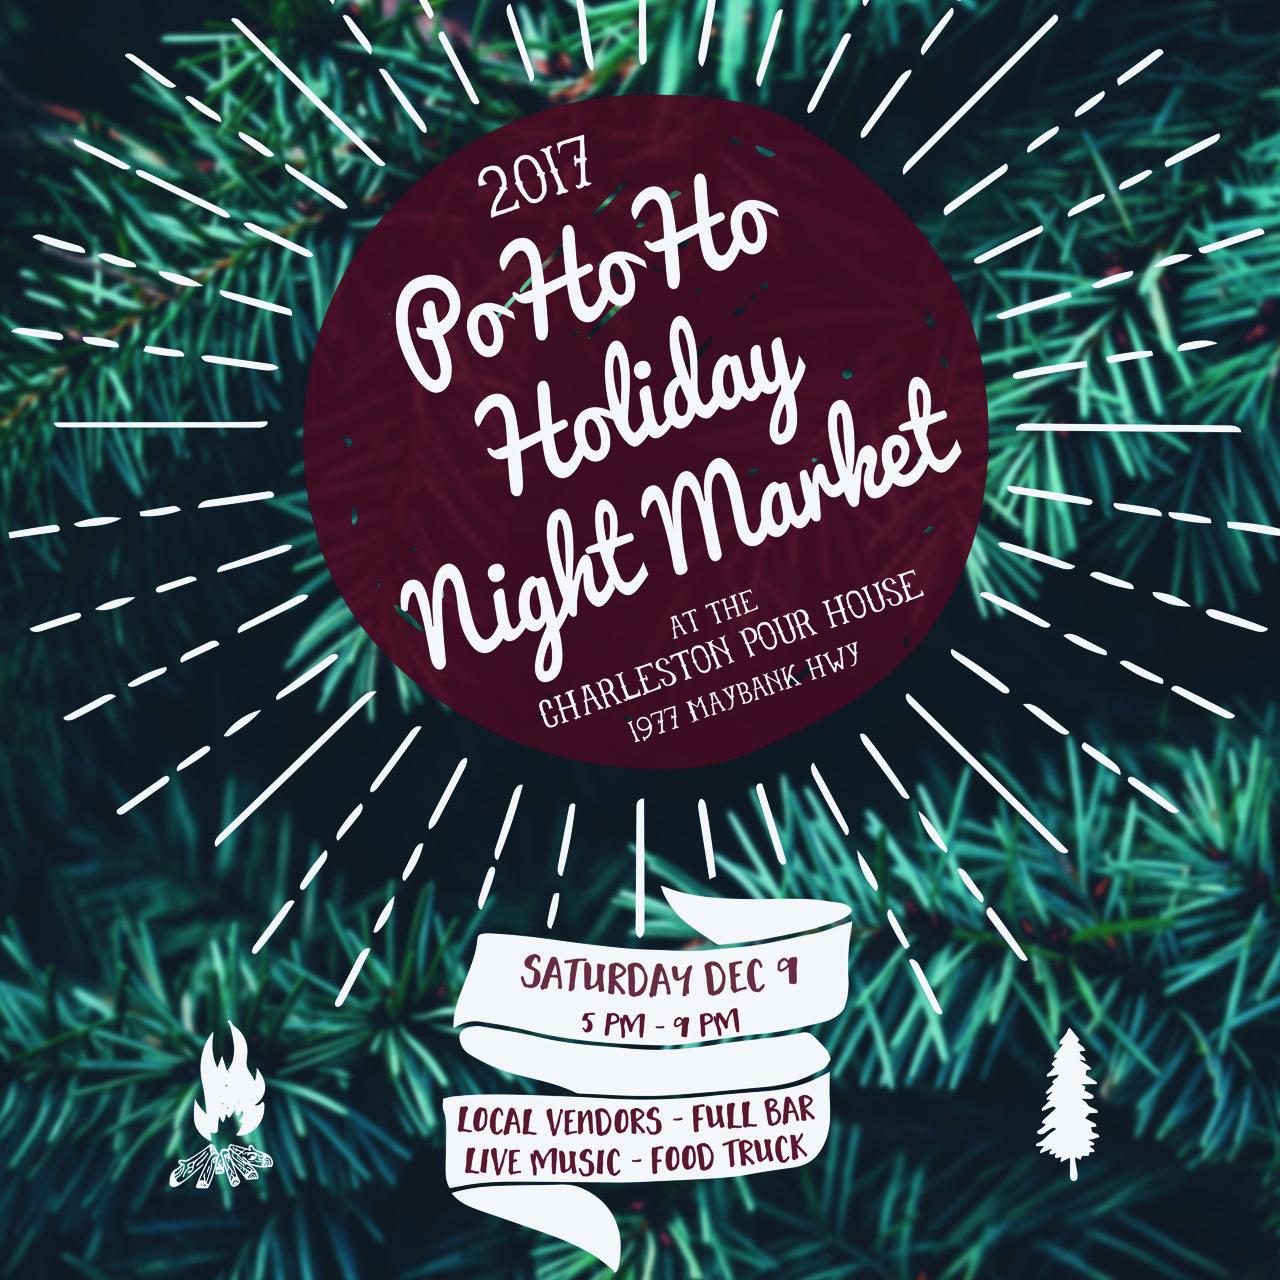 PoHoHo night market instagram and facebook size.jpeg